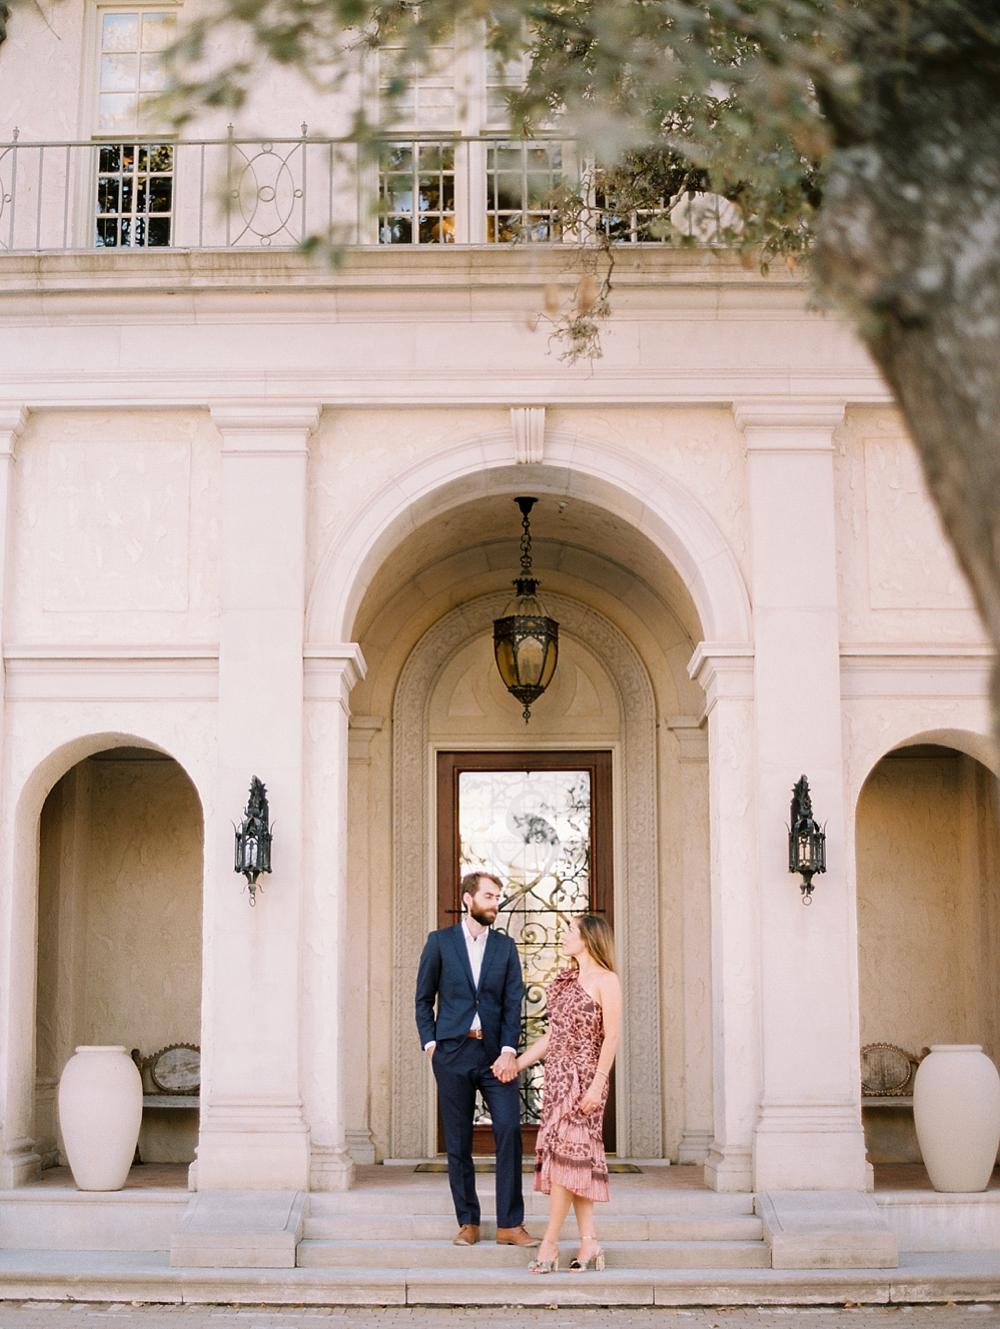 kristin-la-voie-photography-Austin-Wedding-Photographer-laguna-gloria-commodore-perry-estate-engagement-26